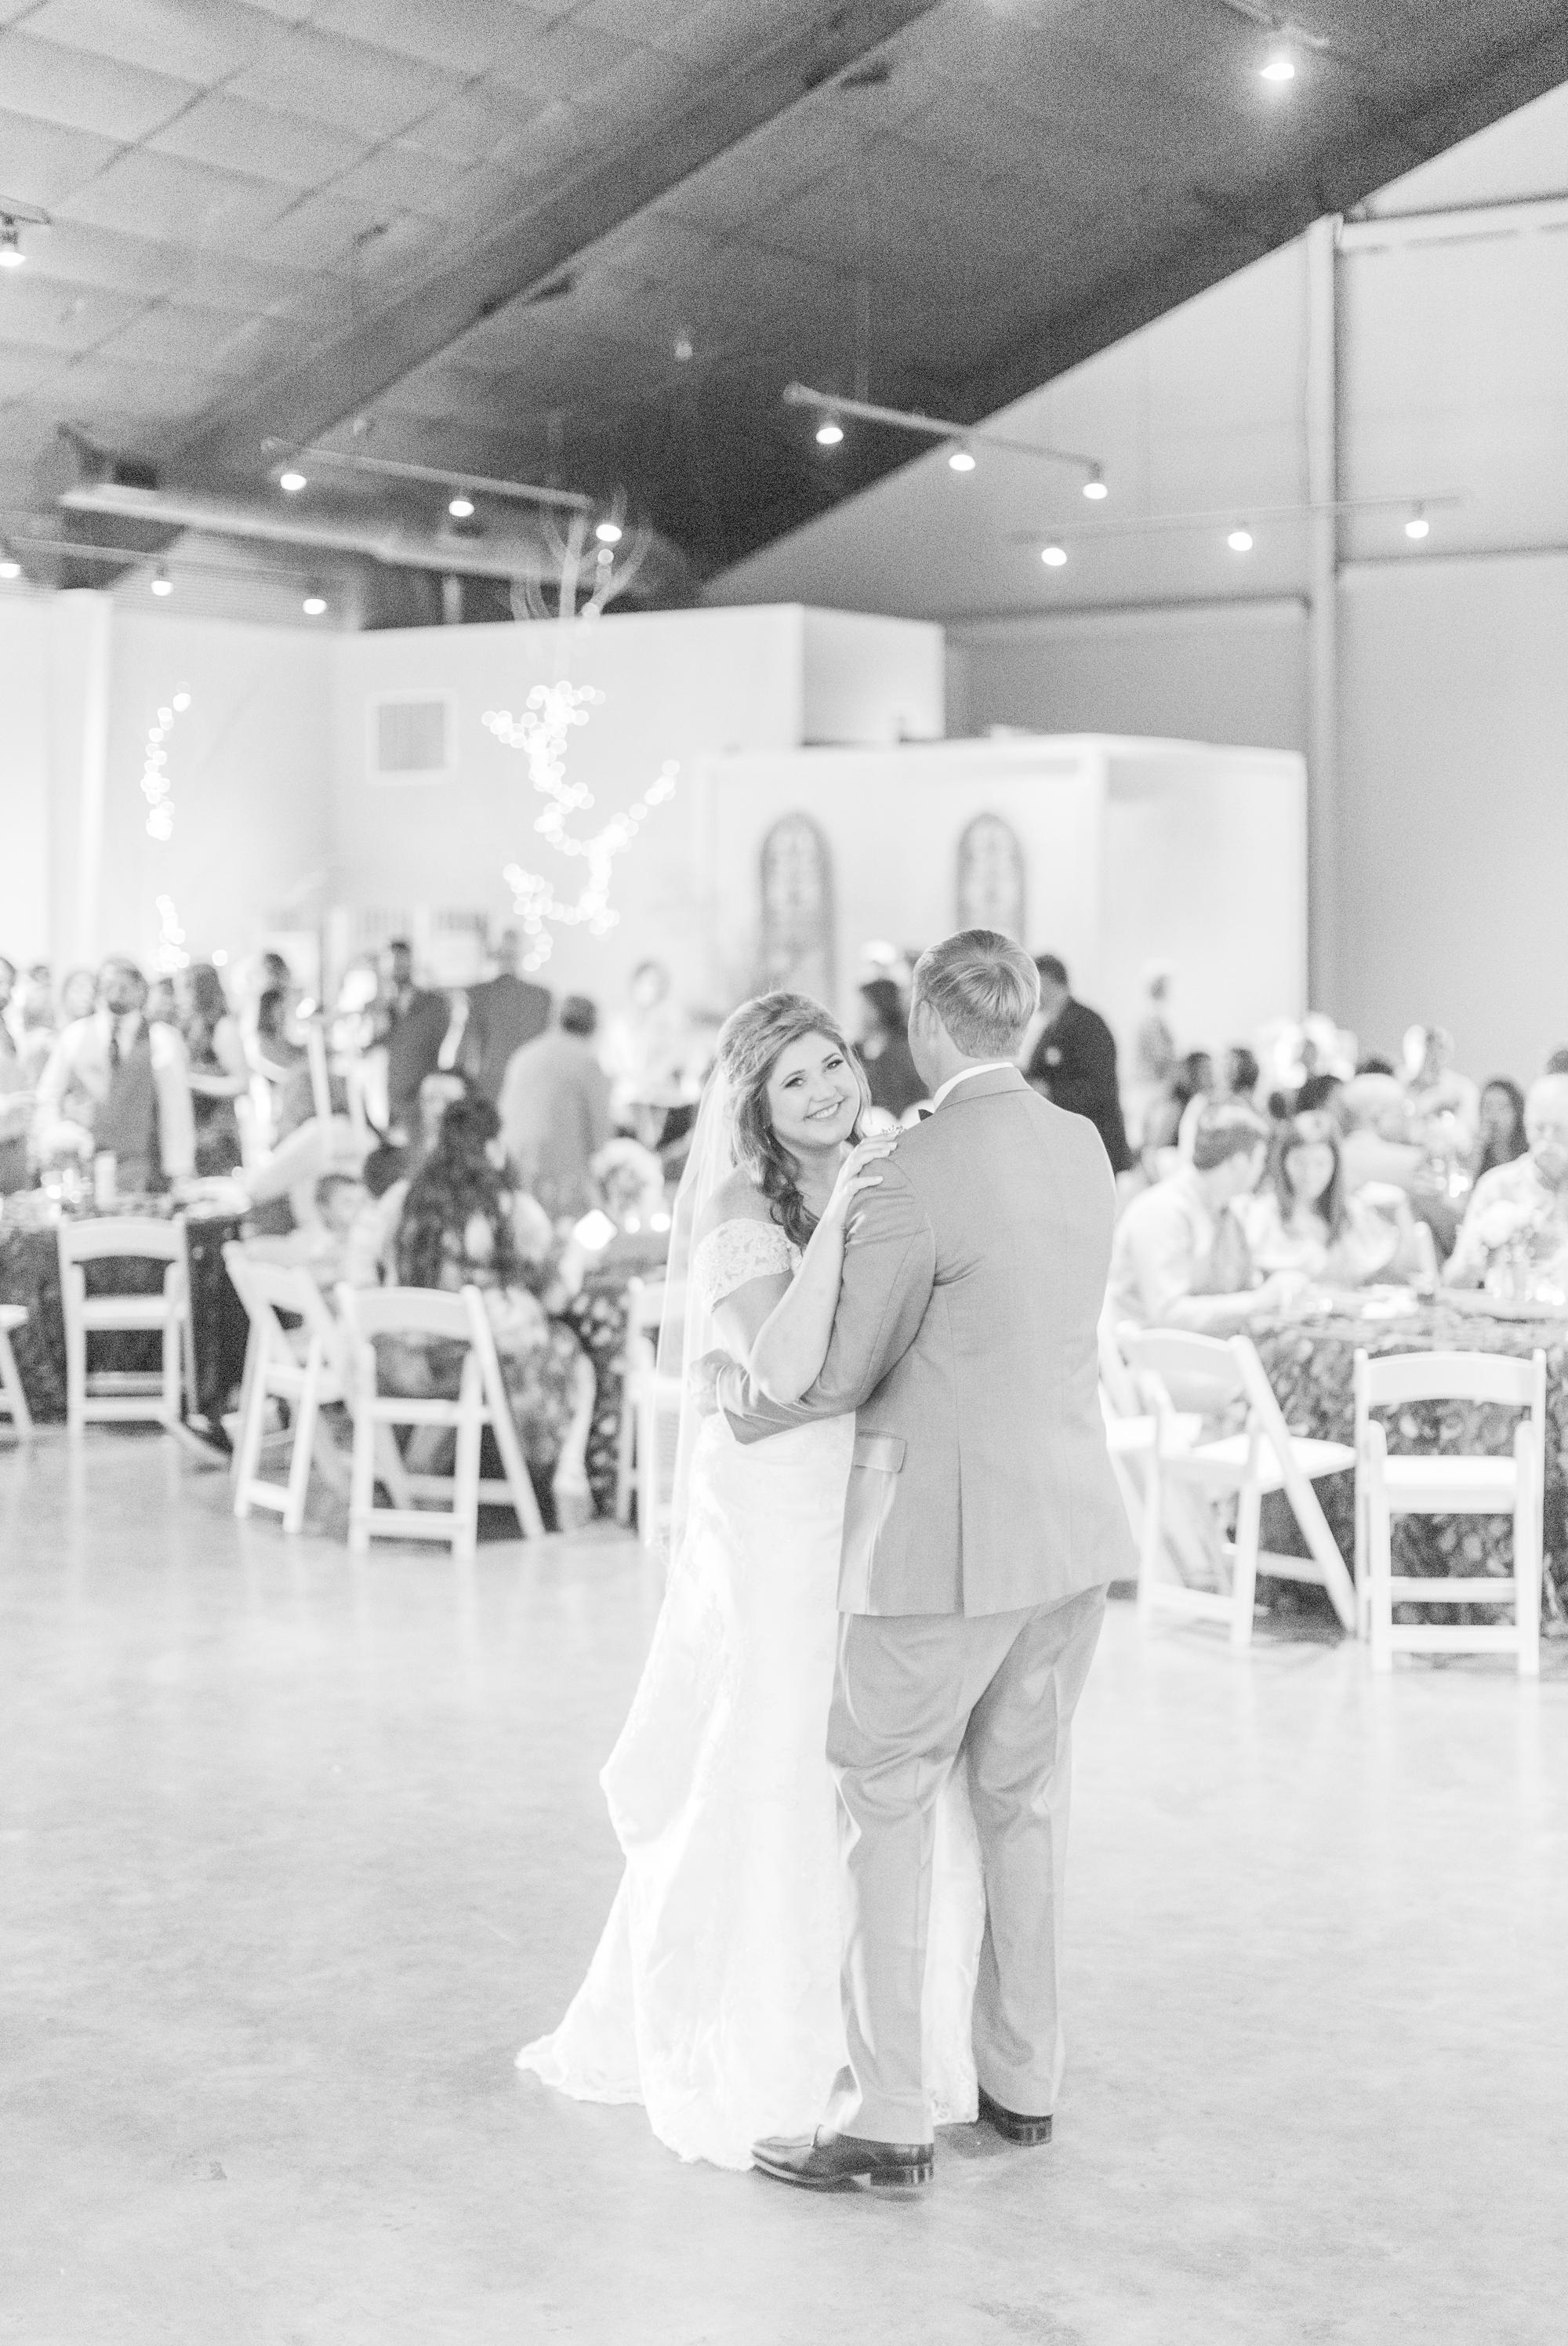 brandon-mississippi-fall-wedding 48.jpg